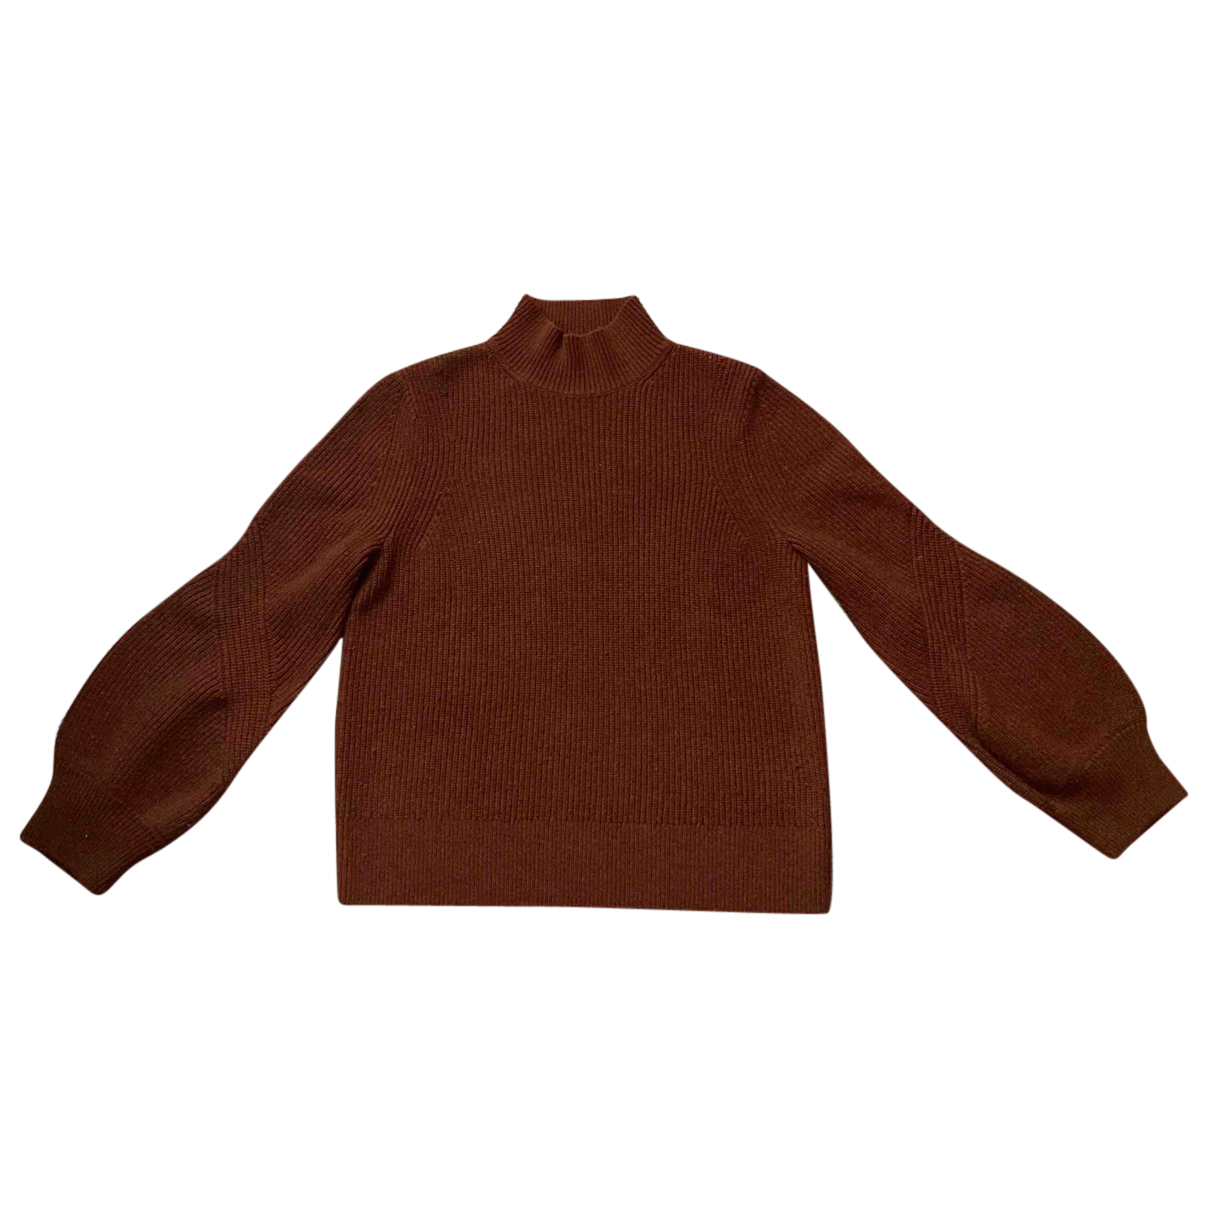 & Stories N Brown Wool Knitwear for Women M International